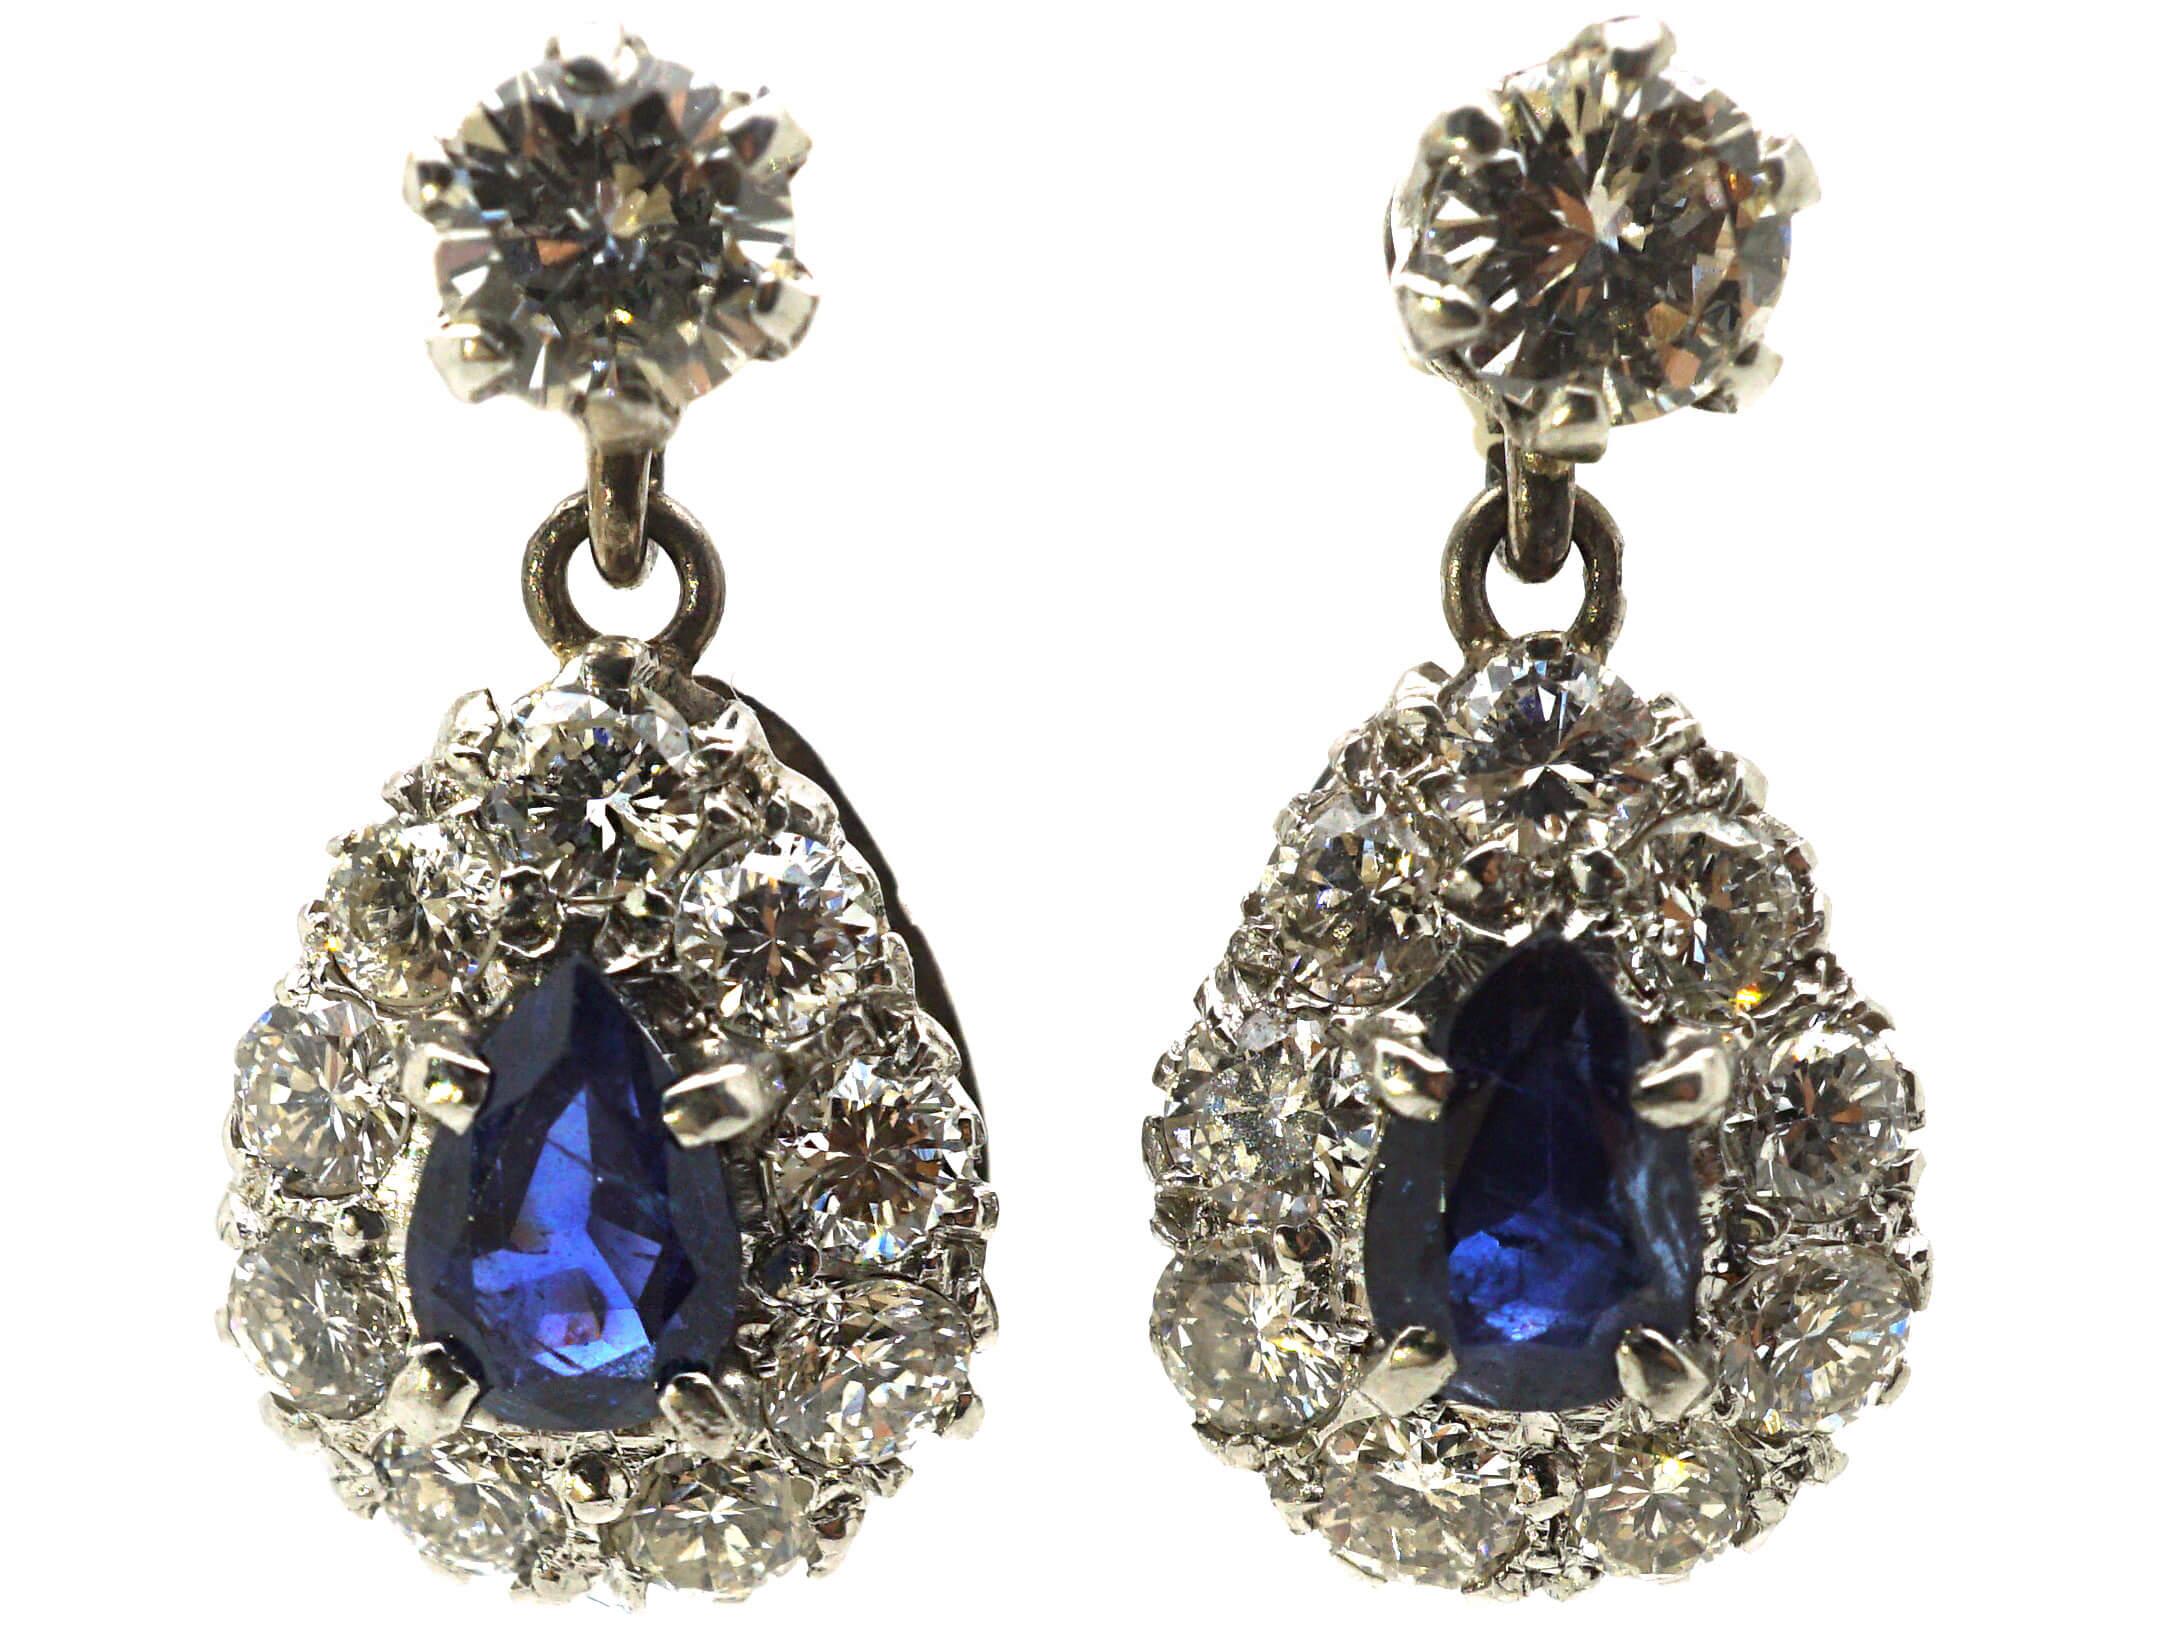 Edwardian 18ct White Gold Sapphire & Diamond Pear Shaped Drop Earrings